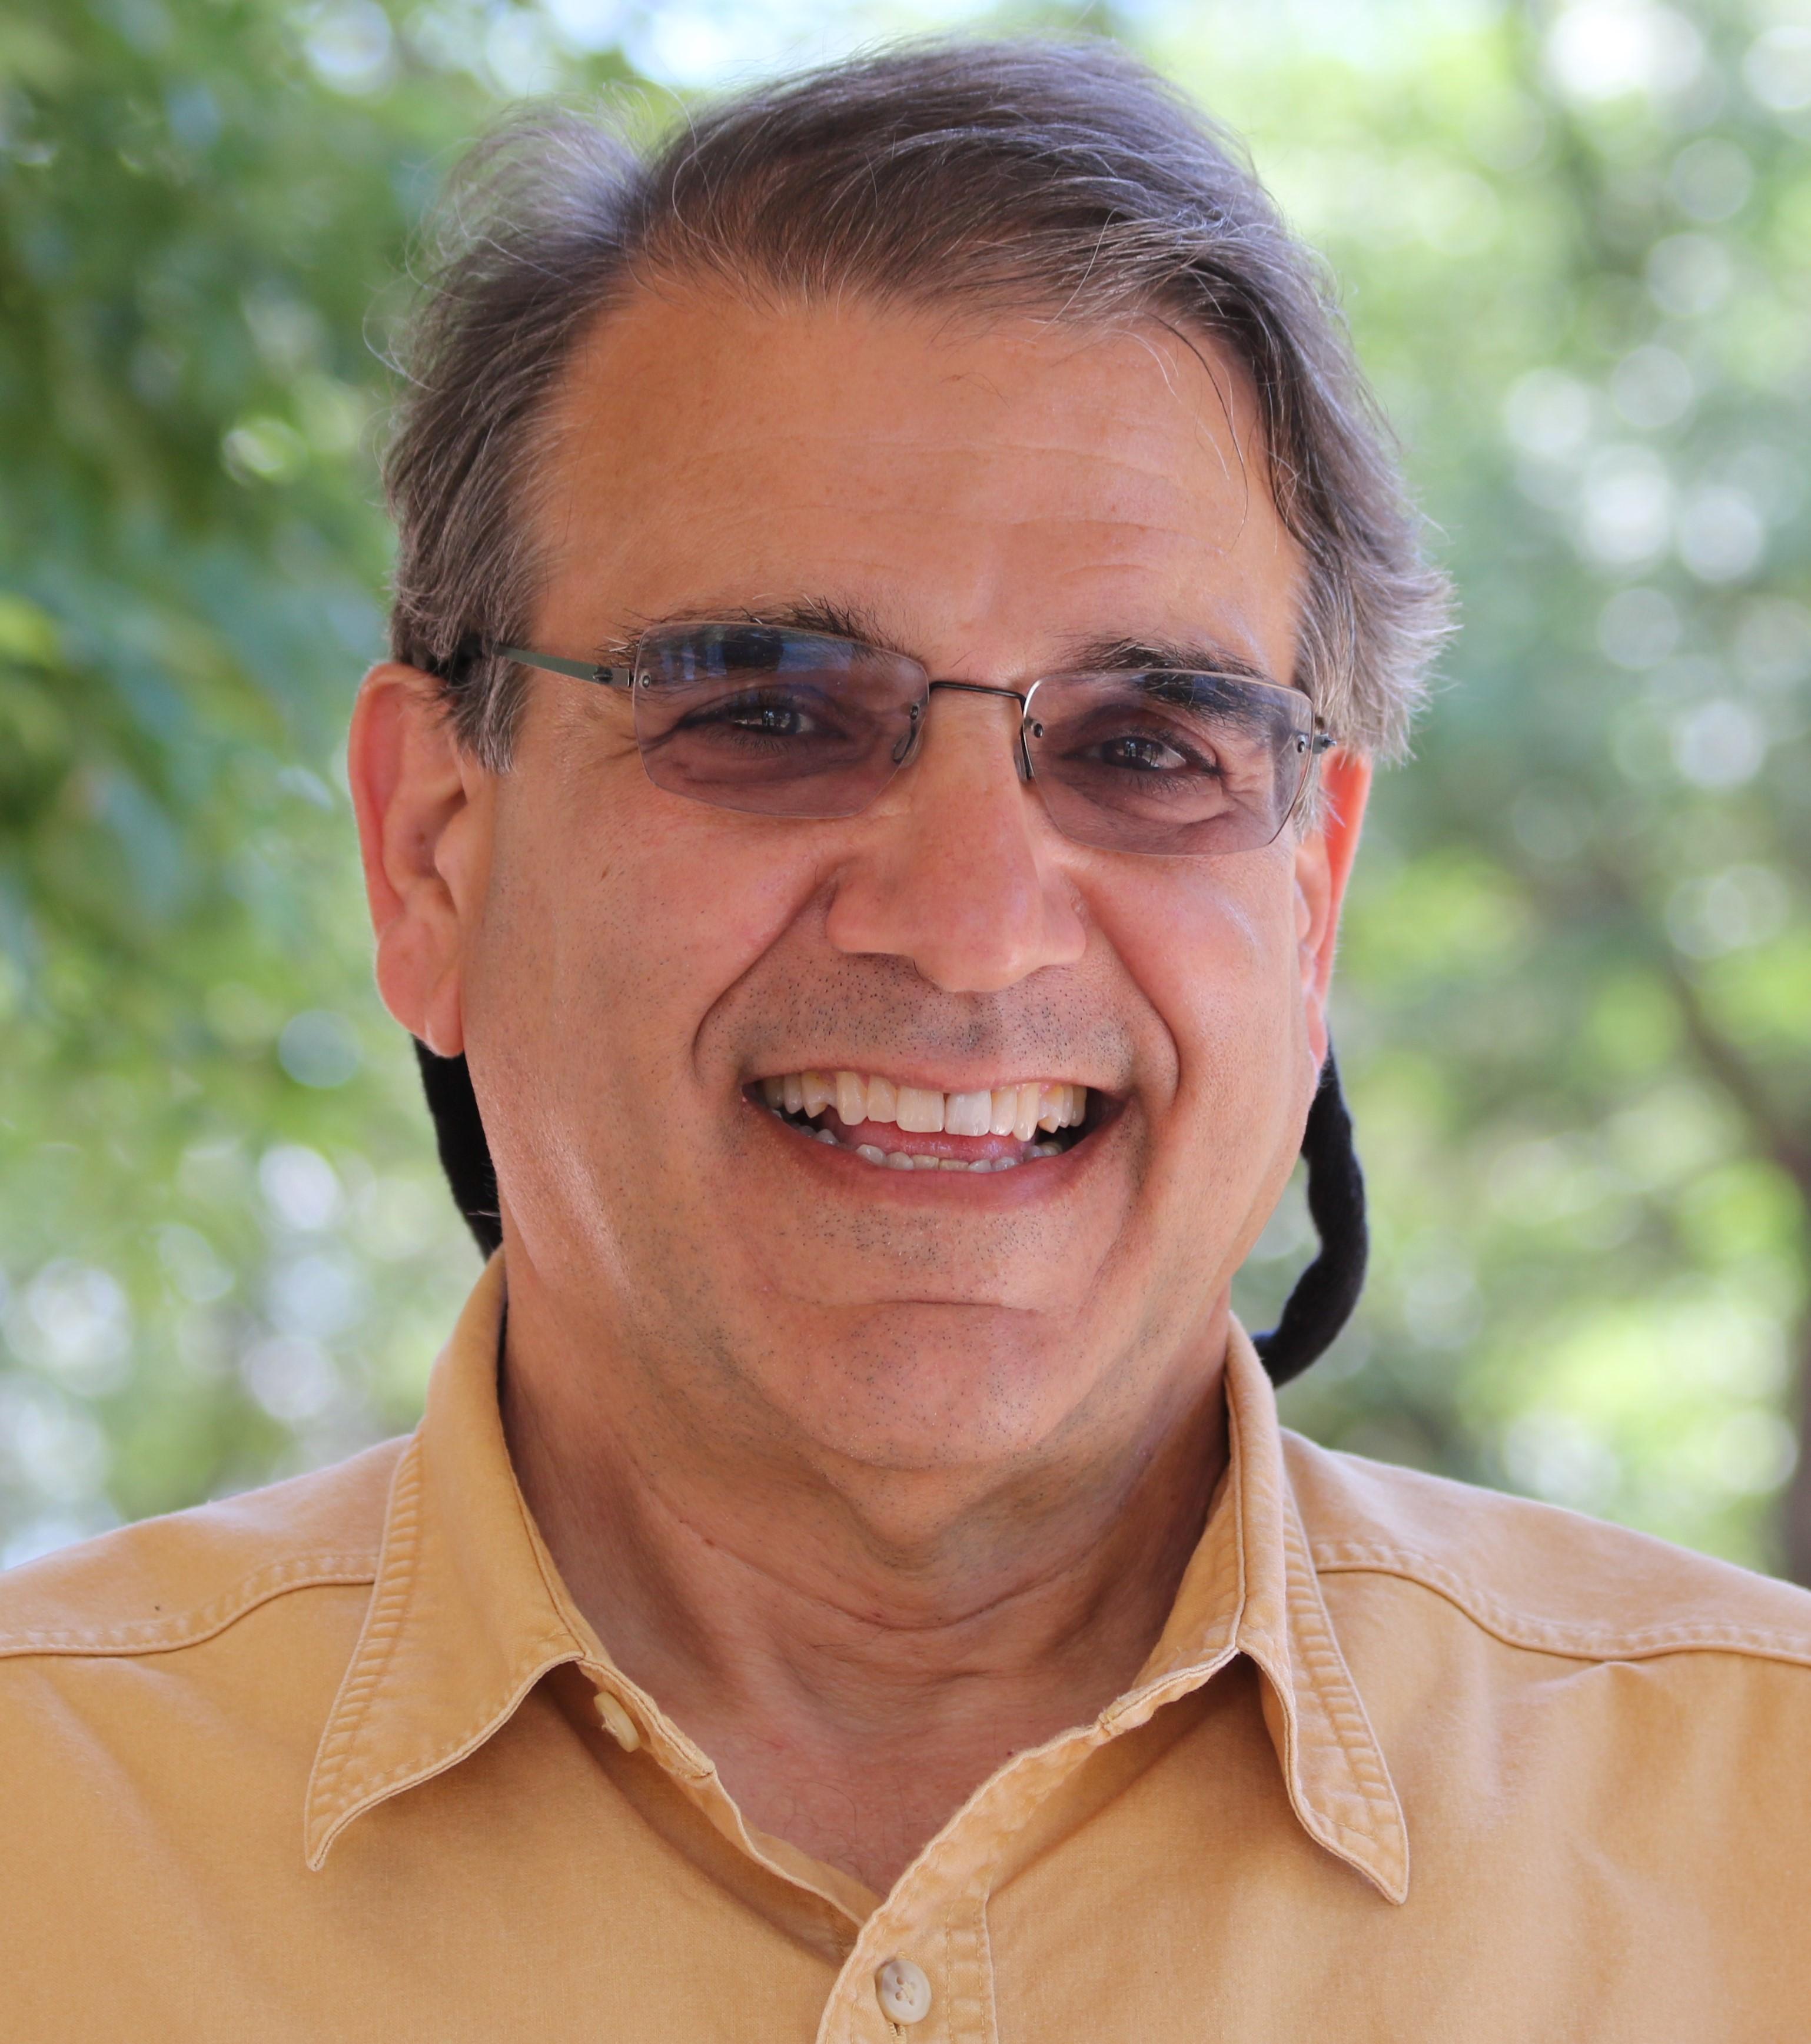 Steve Abdow